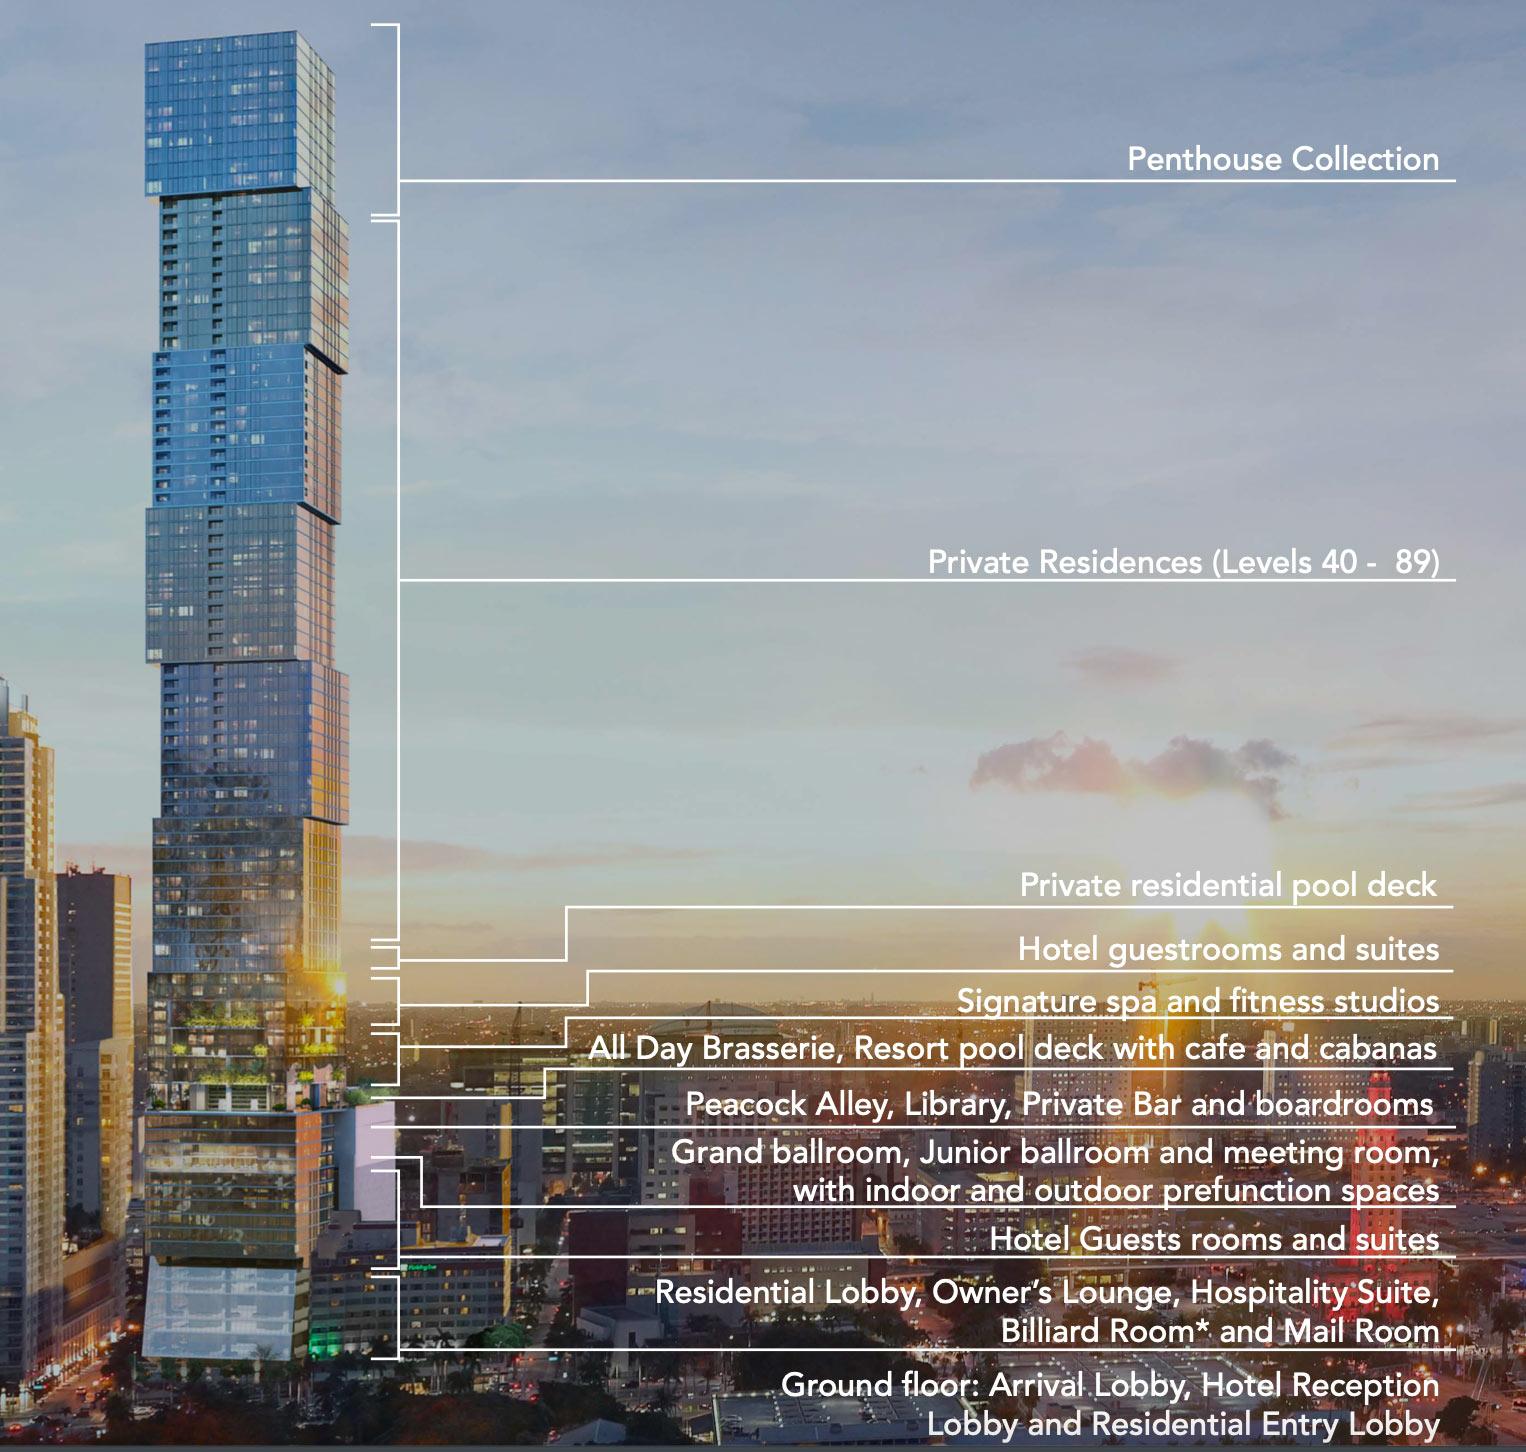 waldorf-astoria-miami-residences-condos-preconstrucion-florida-condos